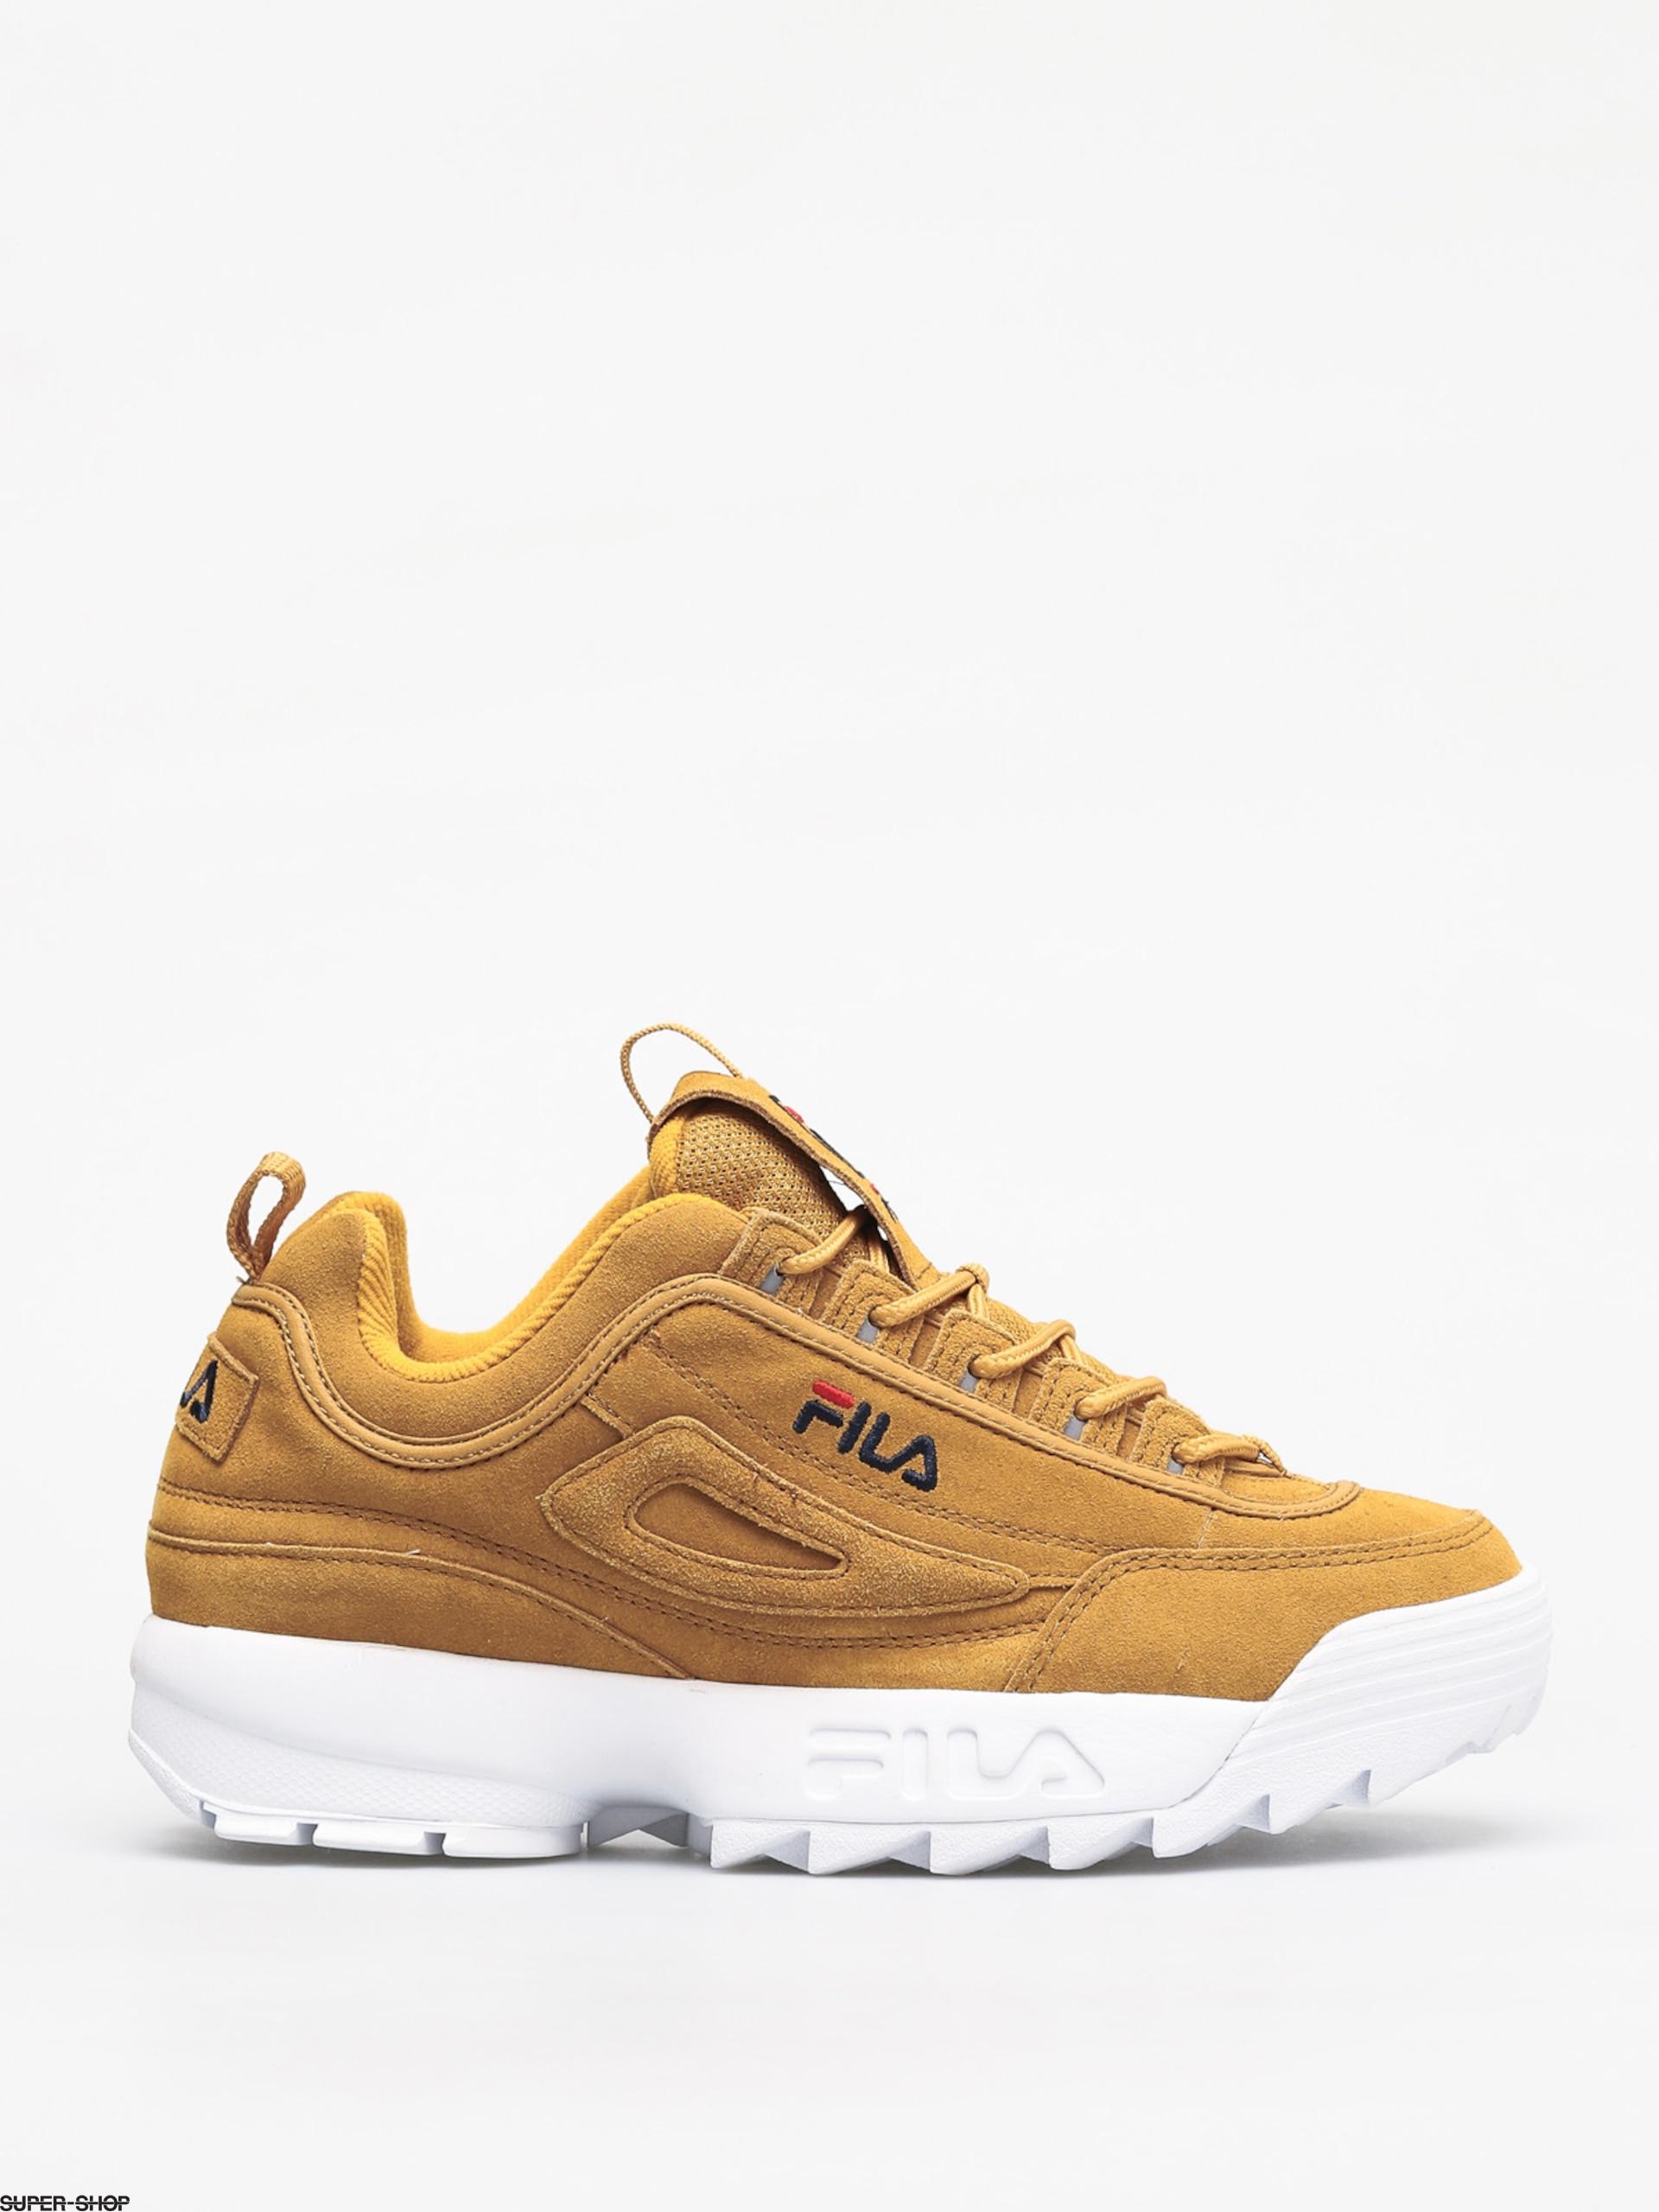 aeac714f947 1031877-w1920-fila-disruptor-low-shoes-inca-gold.jpg